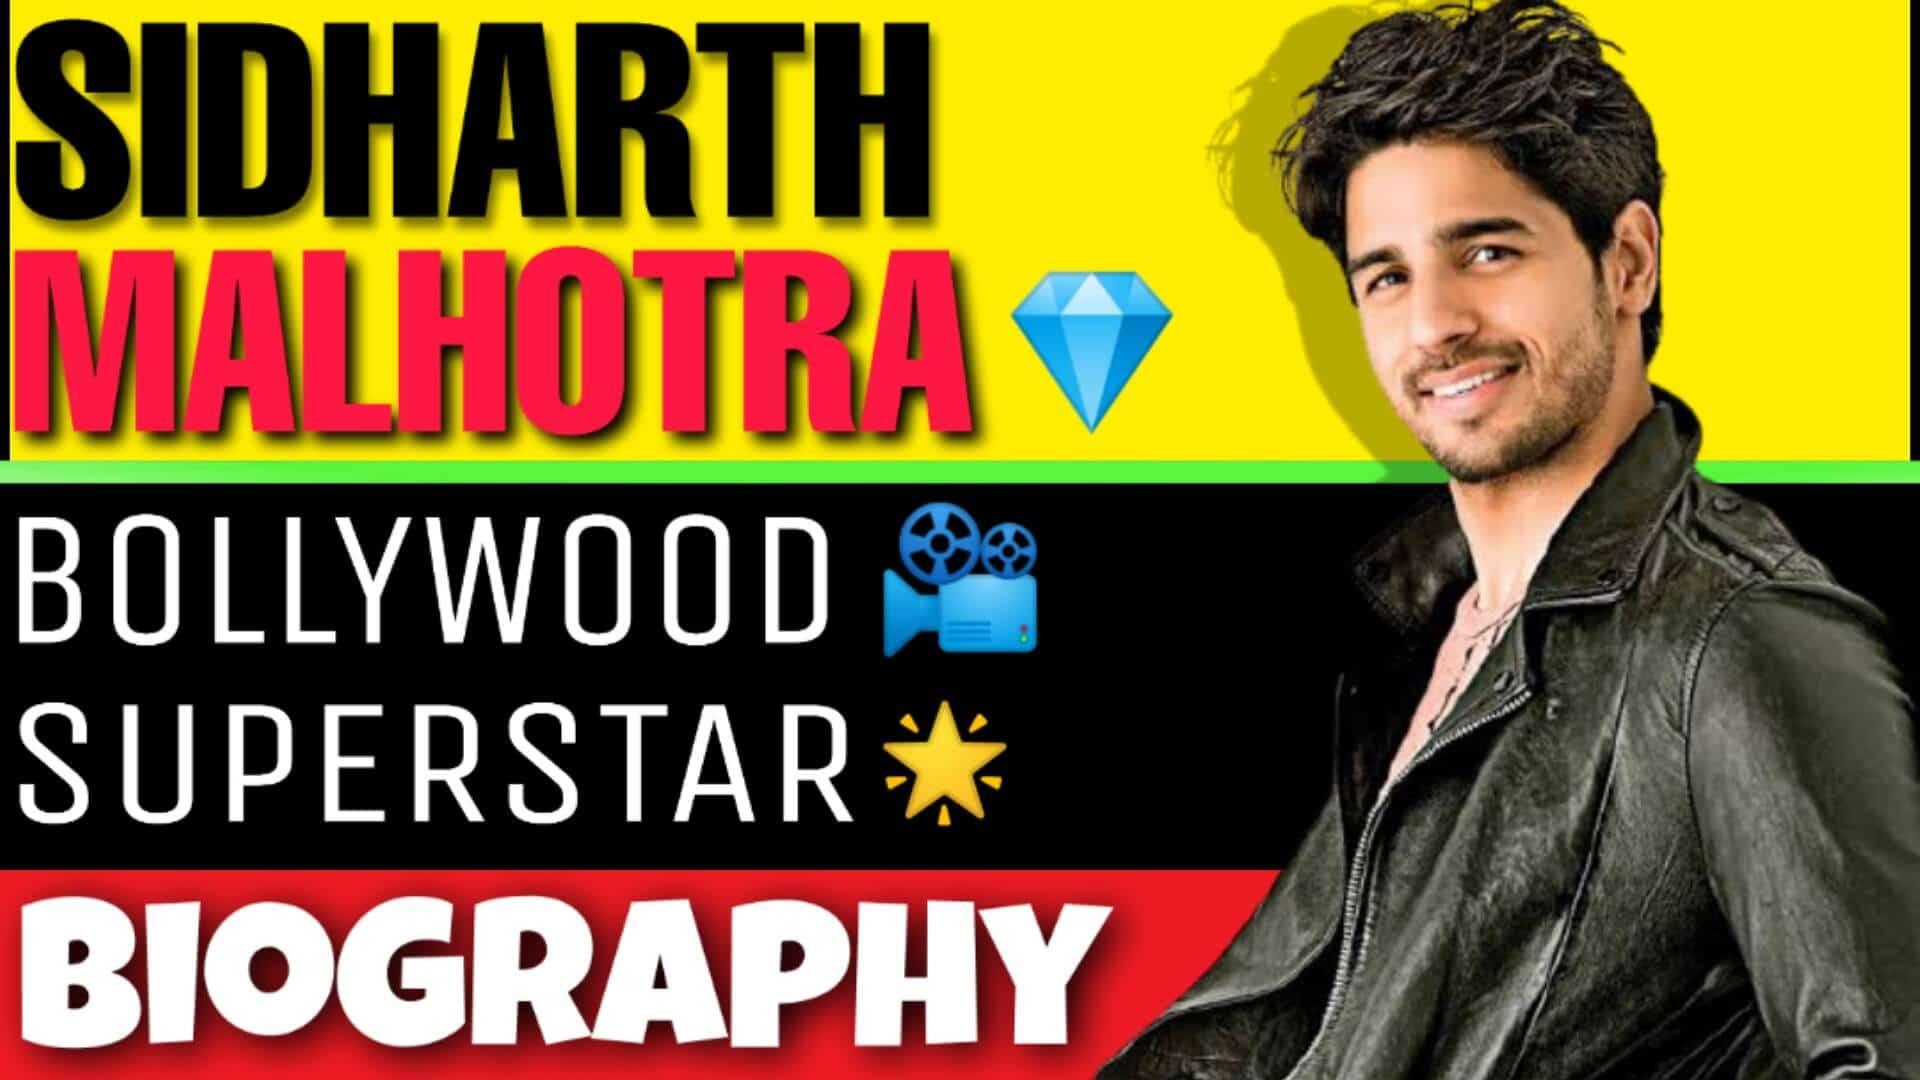 Sidharth Malhotra Biography in Hindi – (सिद्धार्थ मल्होत्रा)